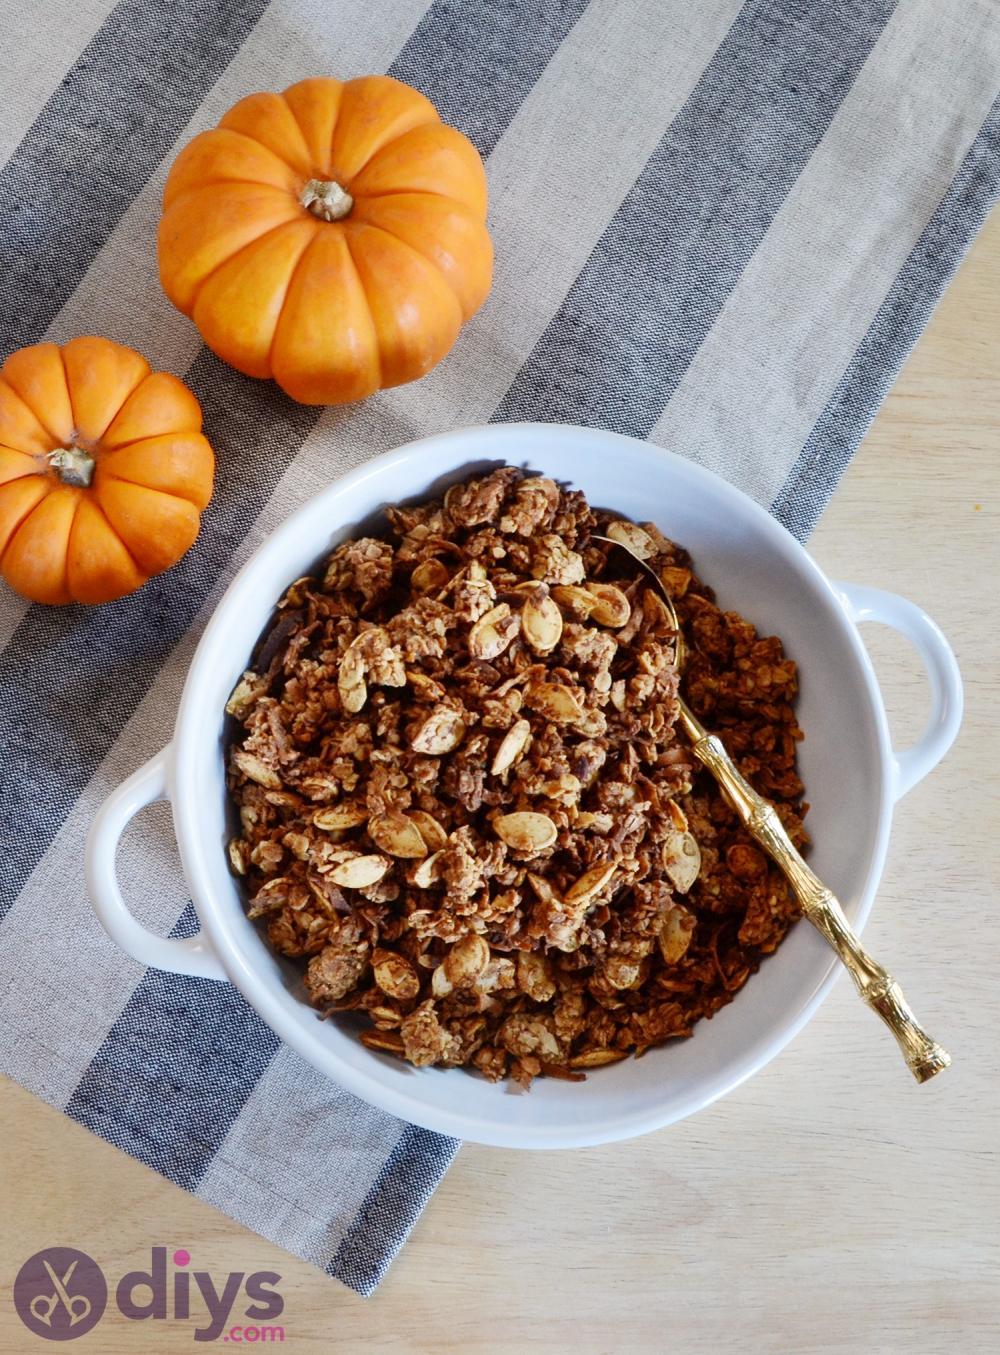 Halloween party food ideas pumpkin spice granola bars